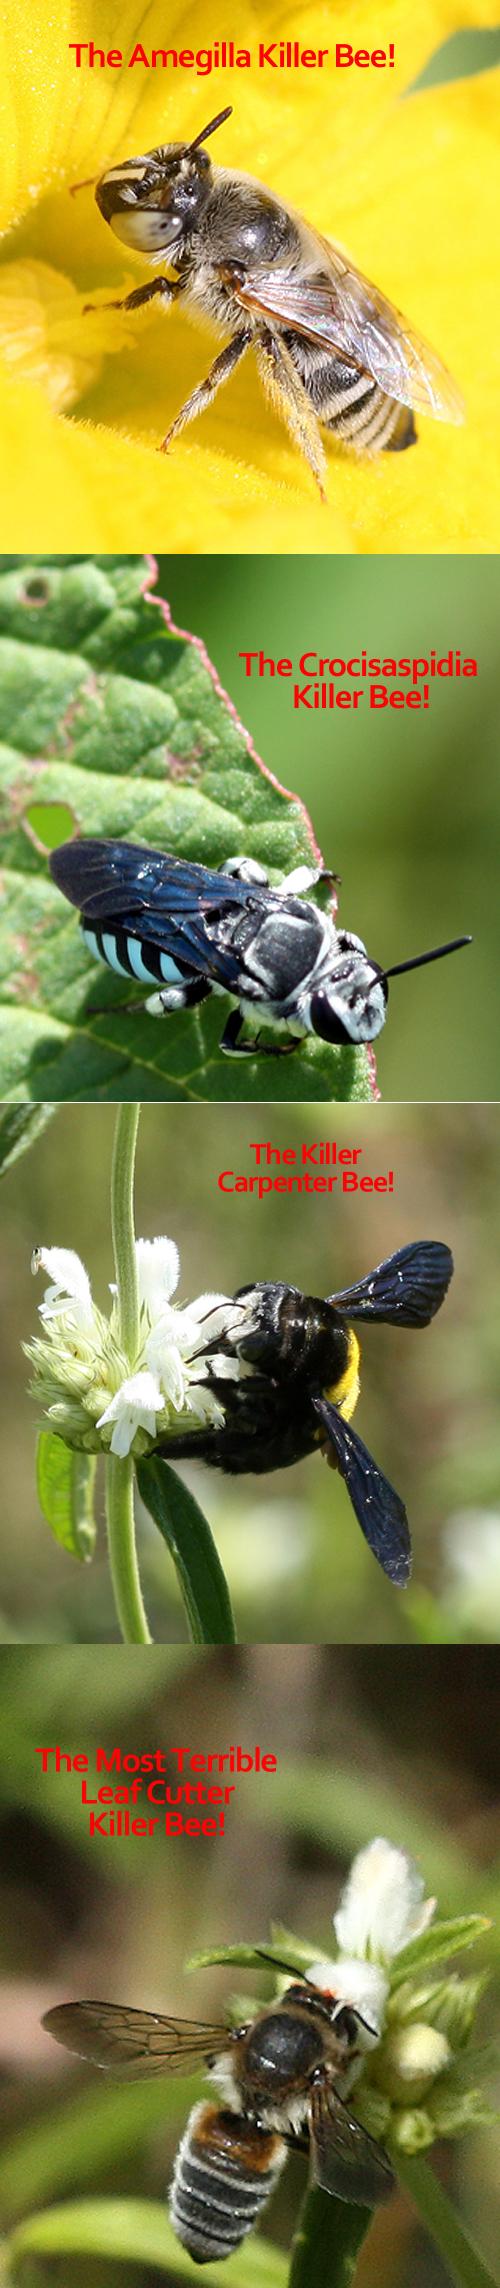 beautifulbees